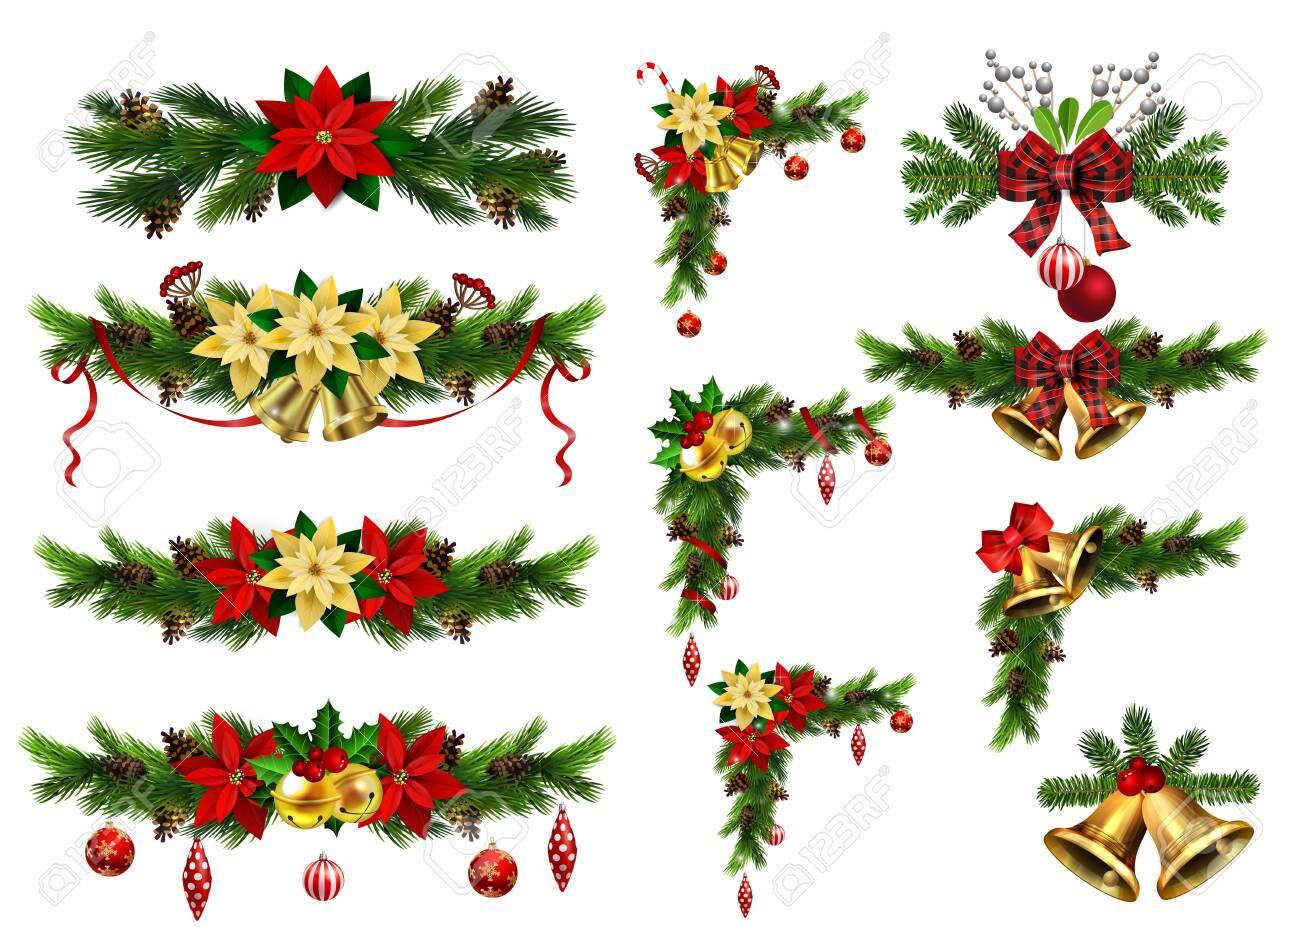 Christmas decorations with fir tree golden jingle bells - 134287312